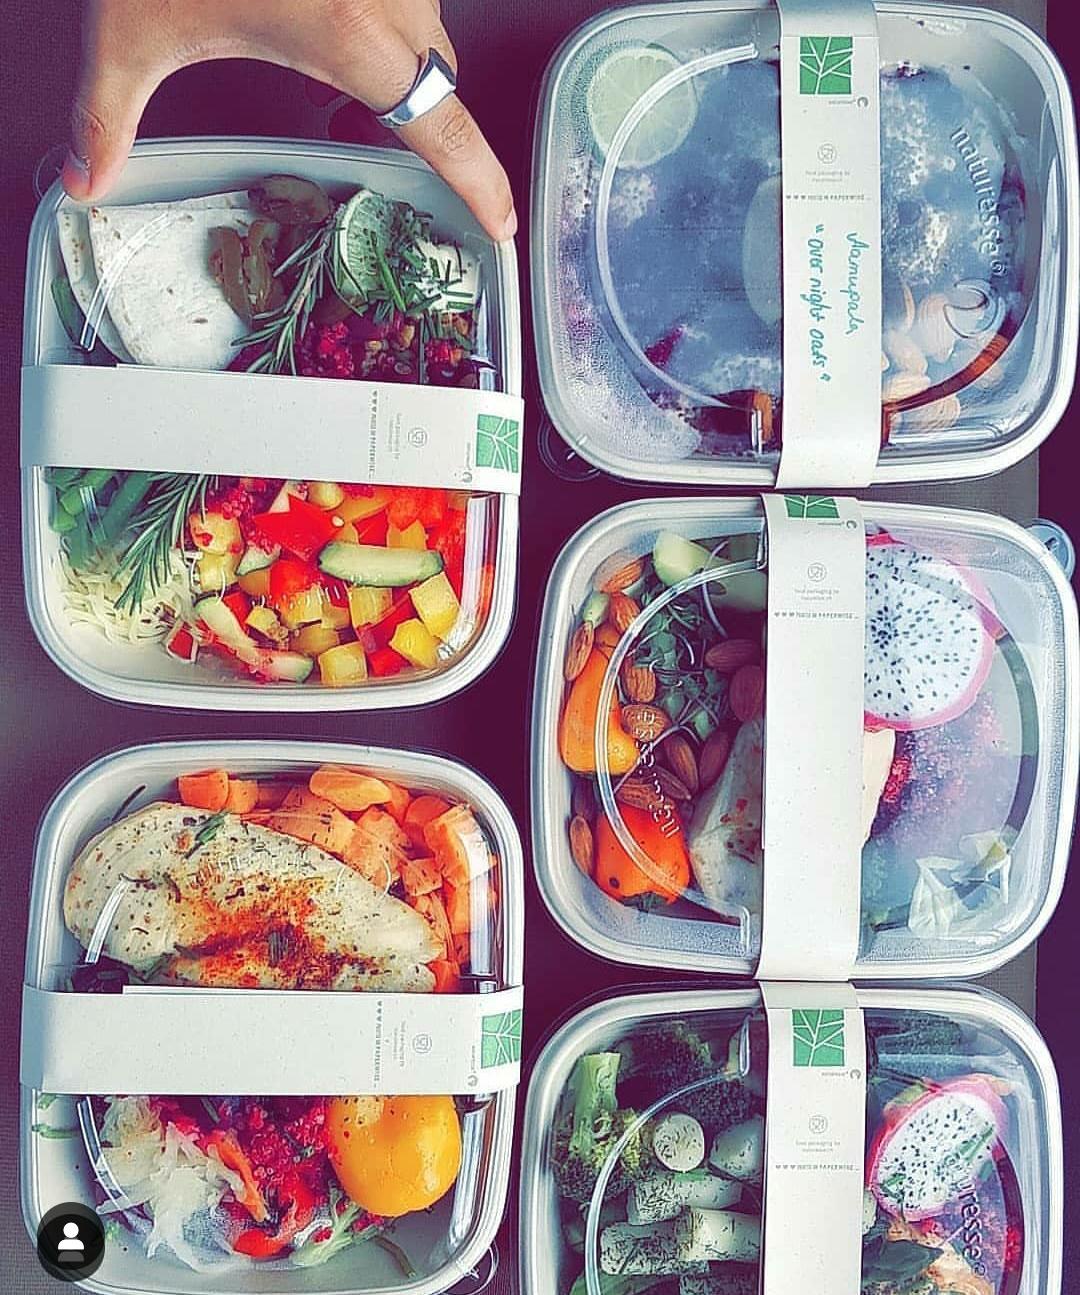 Custom-made Meal plan